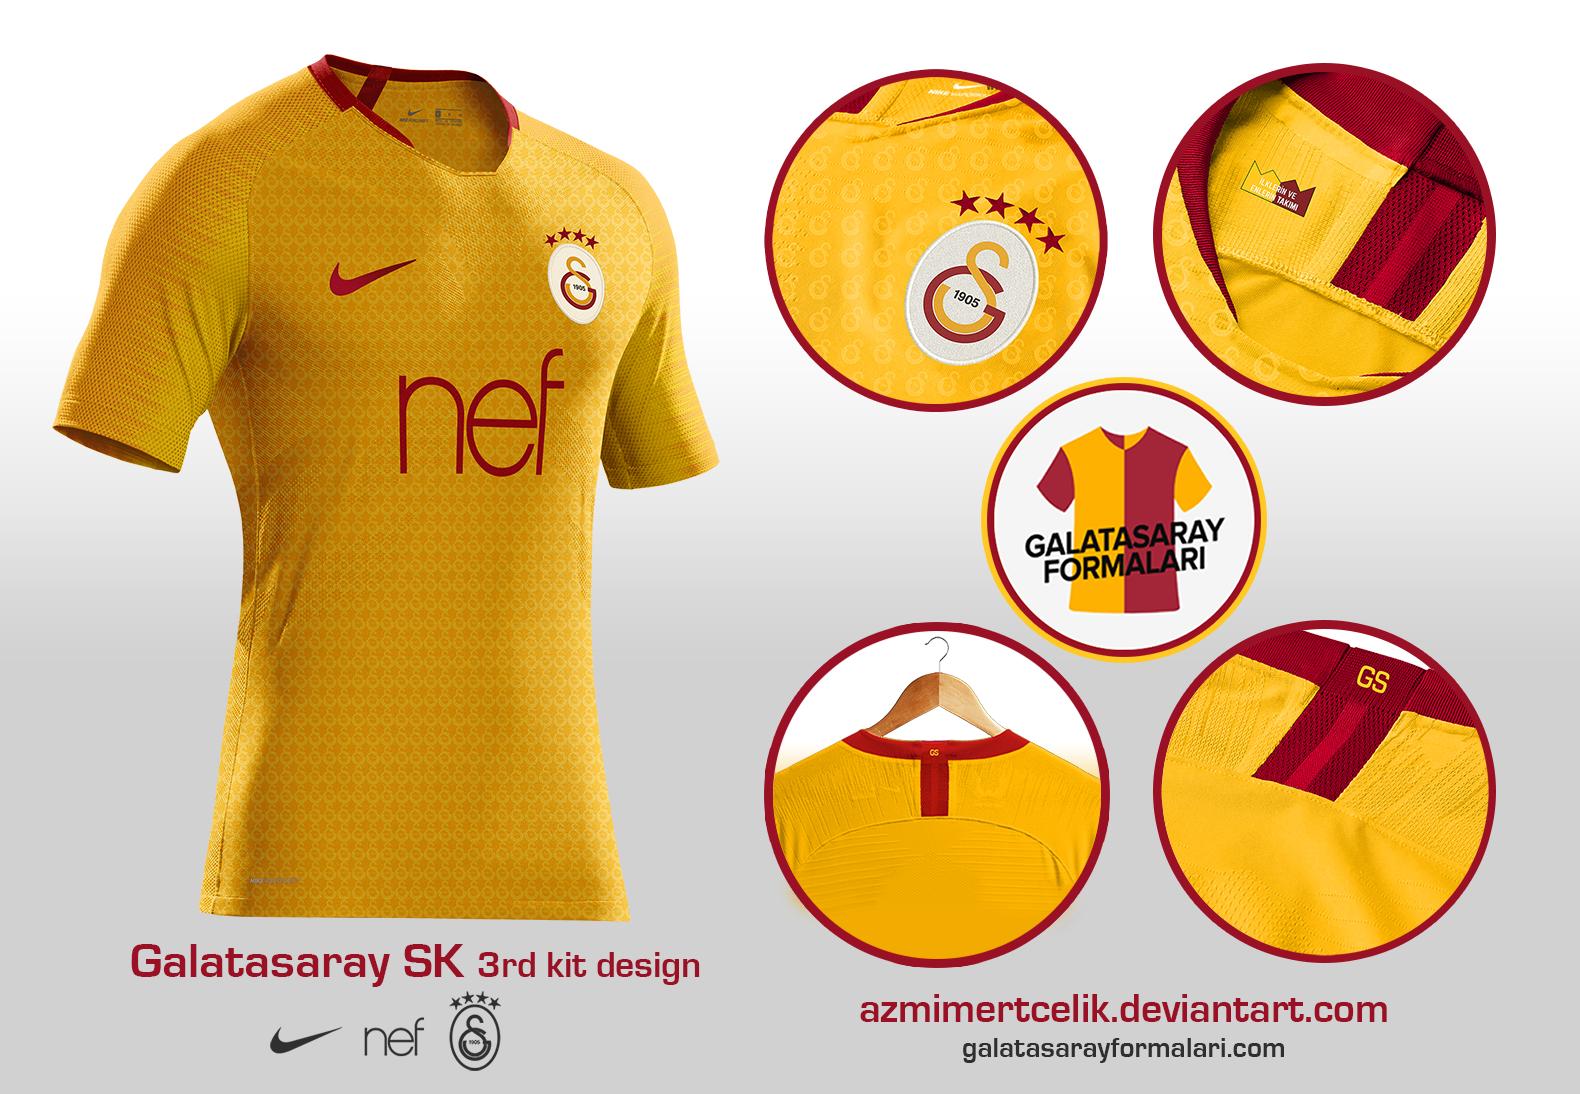 Galatasaray 18-19 Yellow 3rd kit design